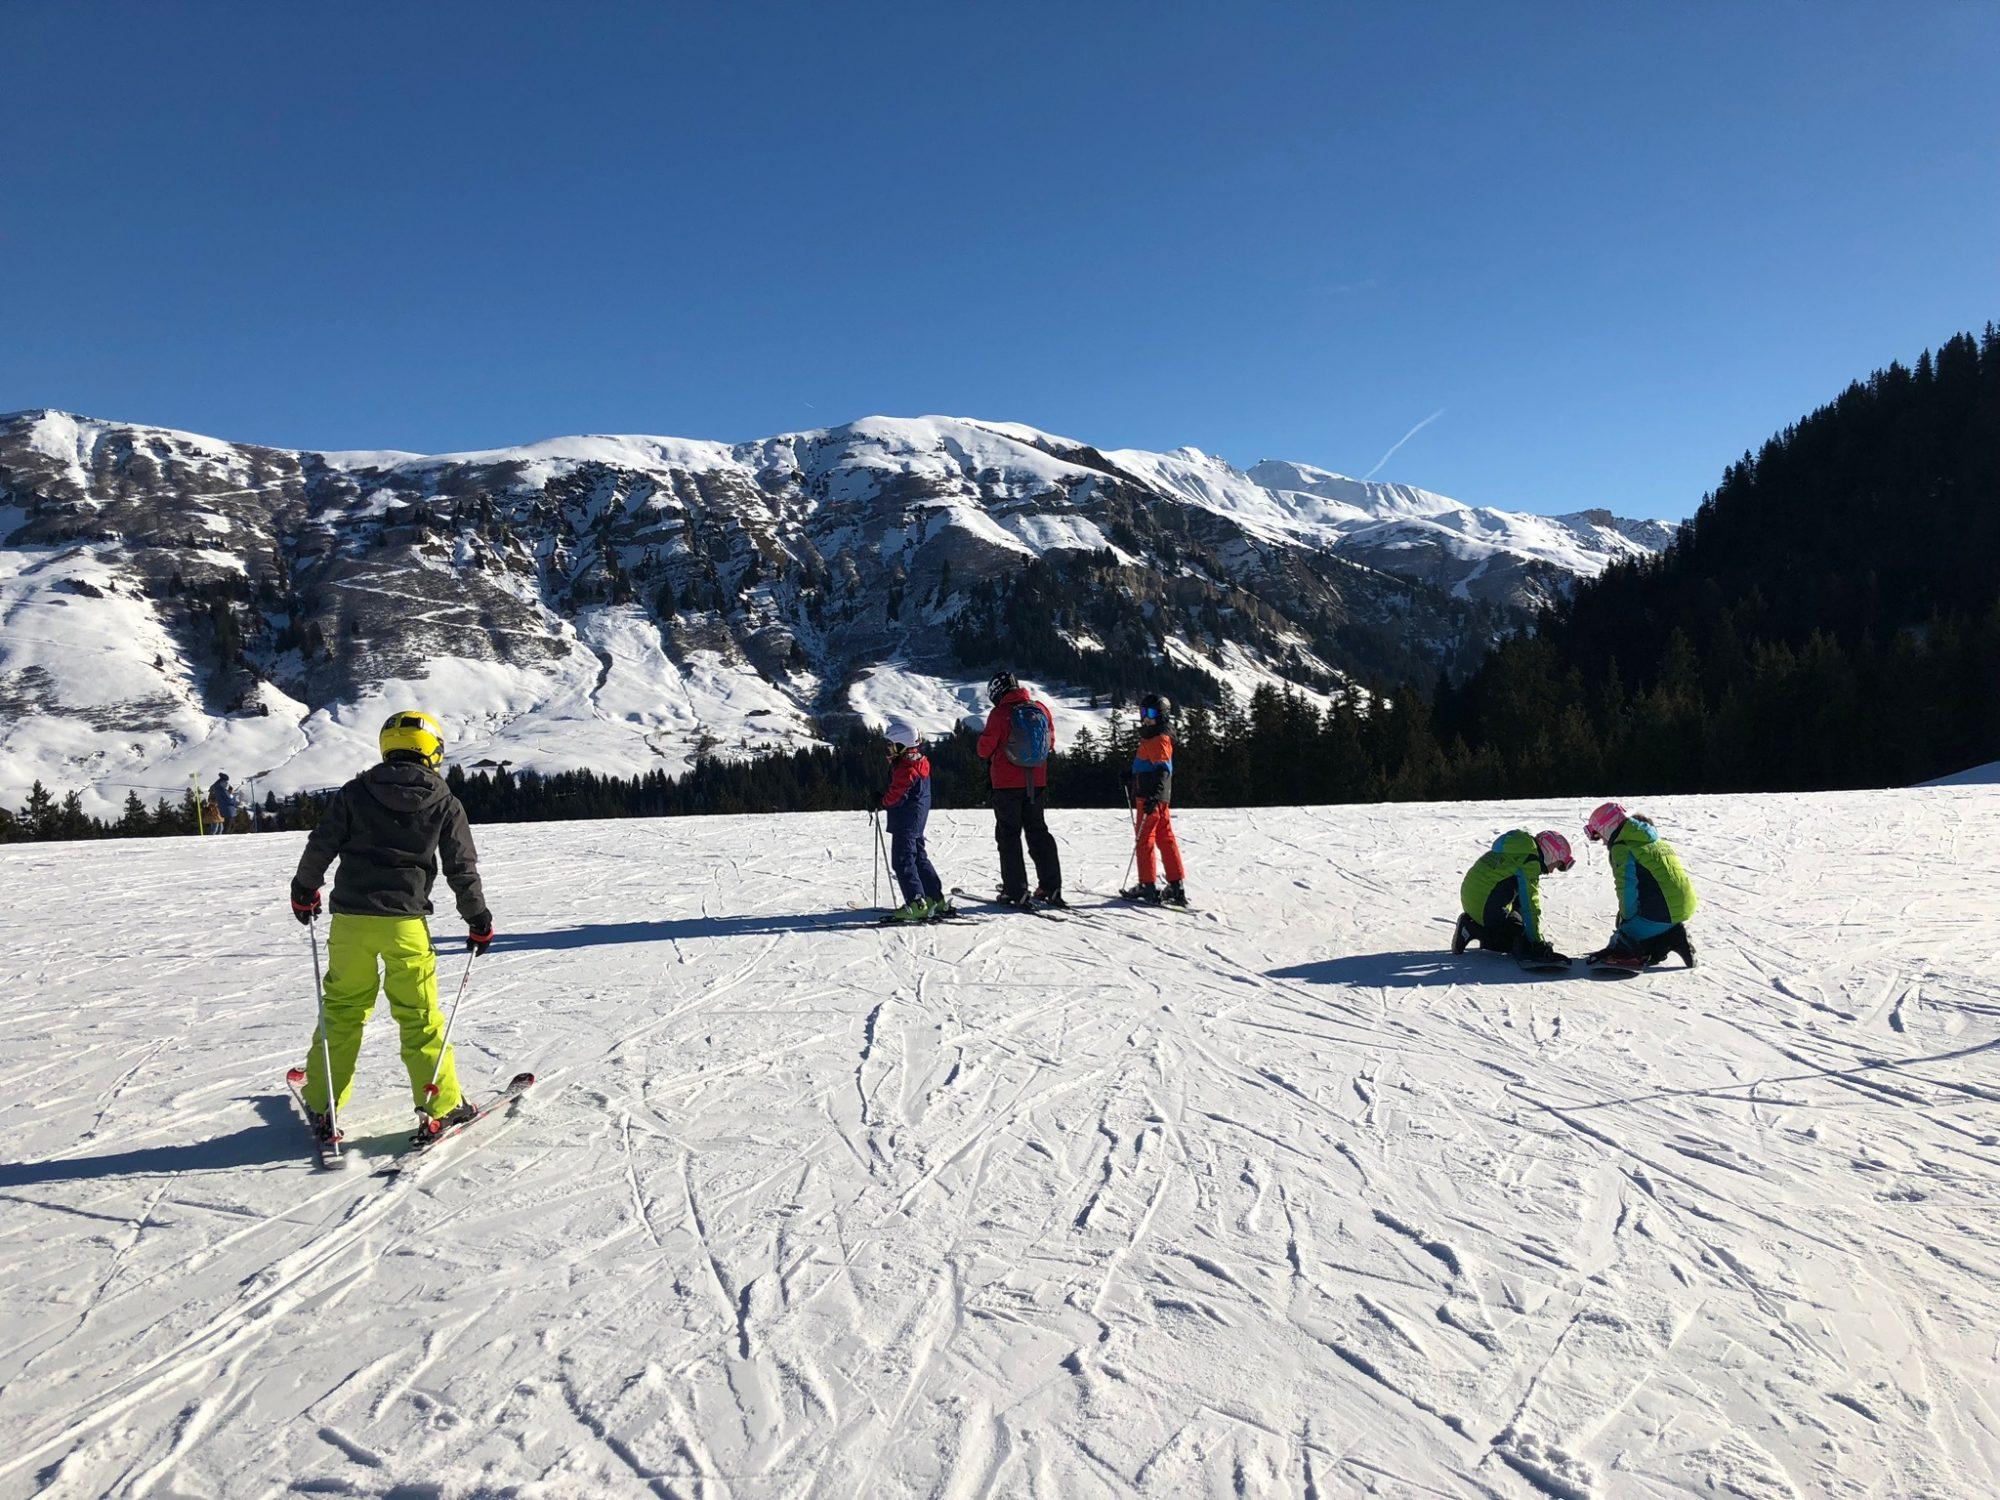 How to ski on ice